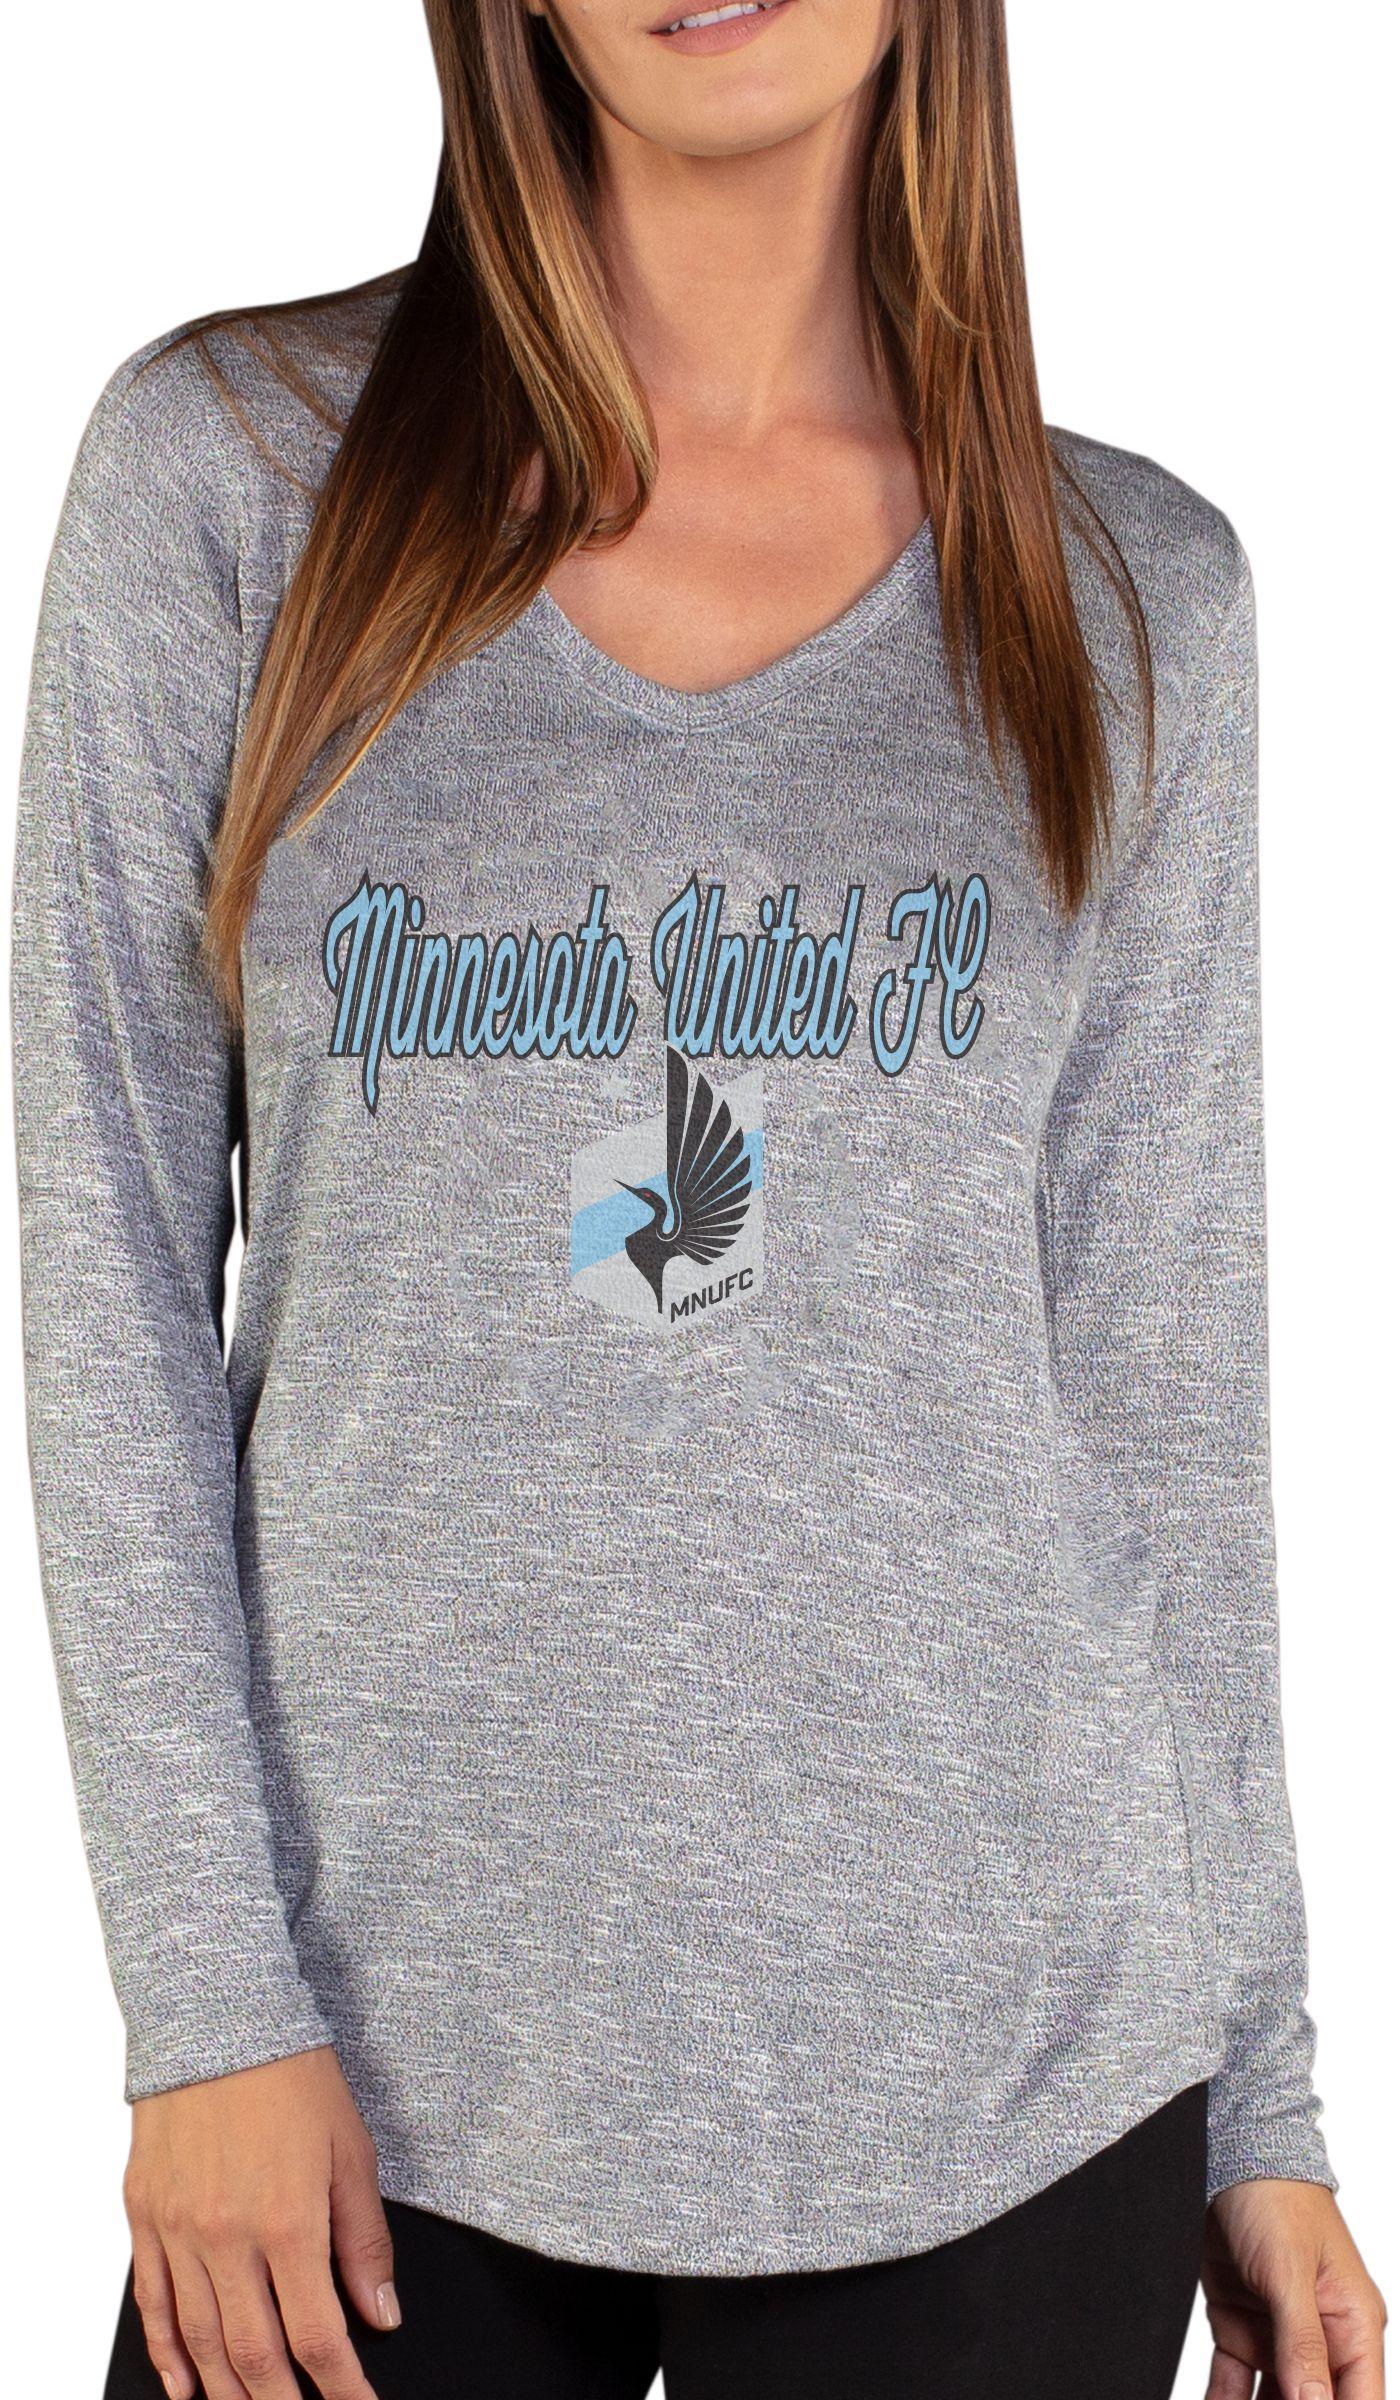 Concepts Sport Women's Minnesota United FC Layover Heather Grey Long Sleeve Shirt